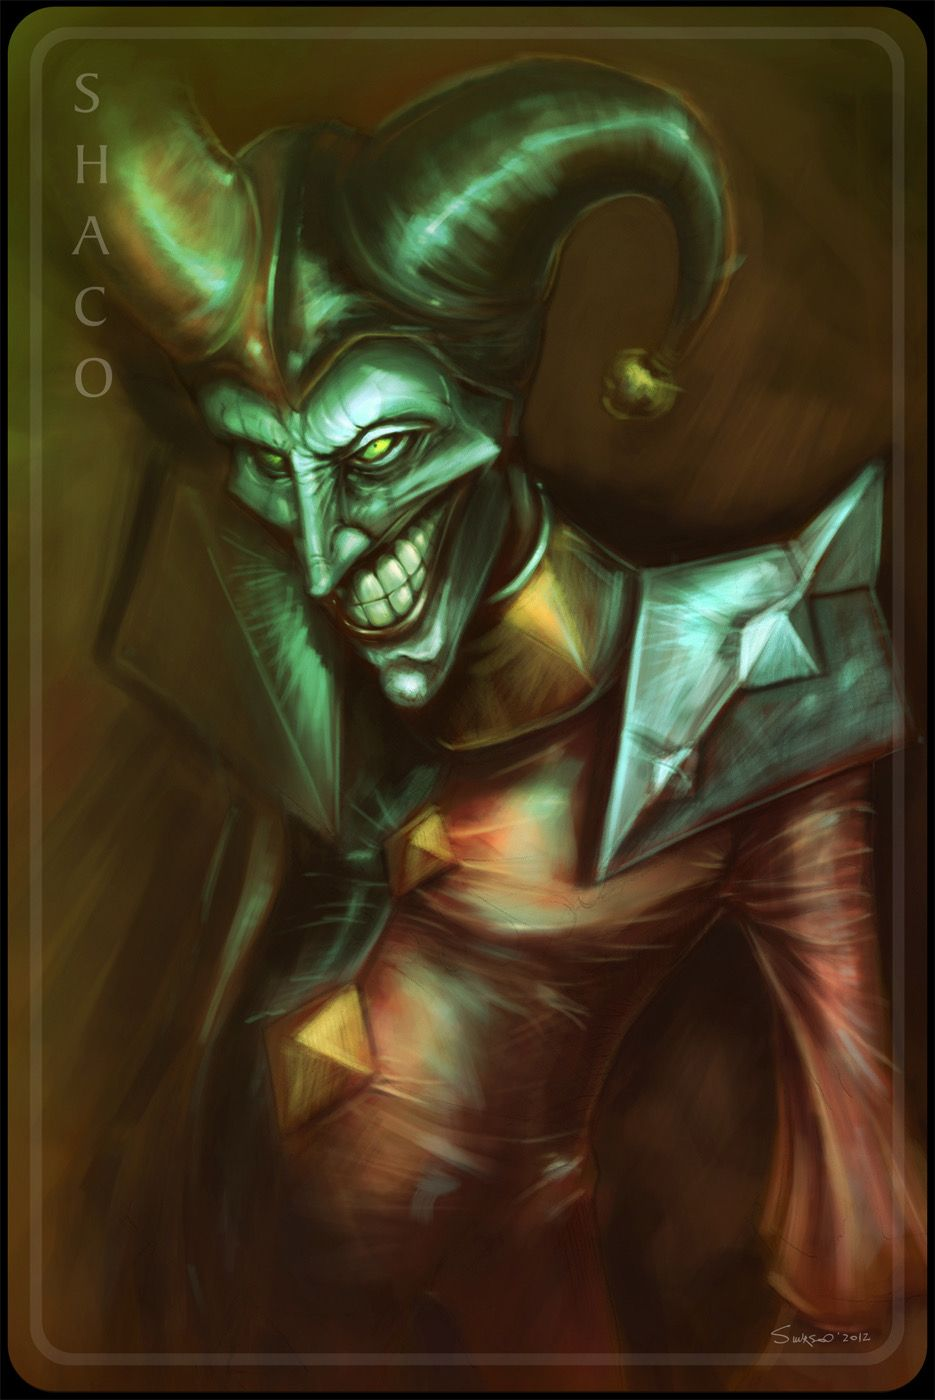 Pin By Suzy Putman On Court Jester Pinterest Evil Clowns Court